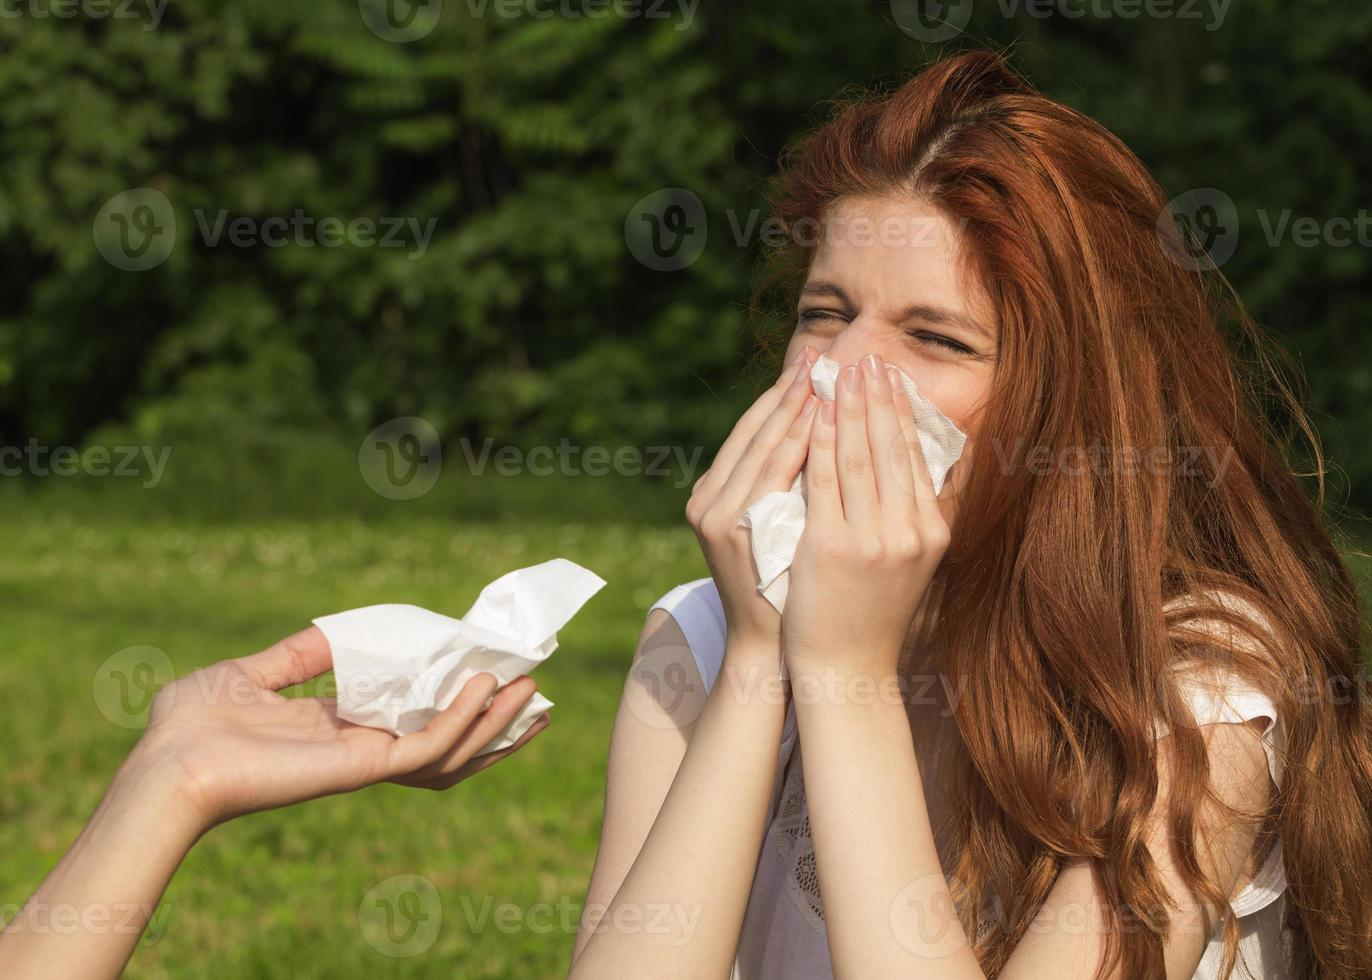 chi soffre di allergie foto